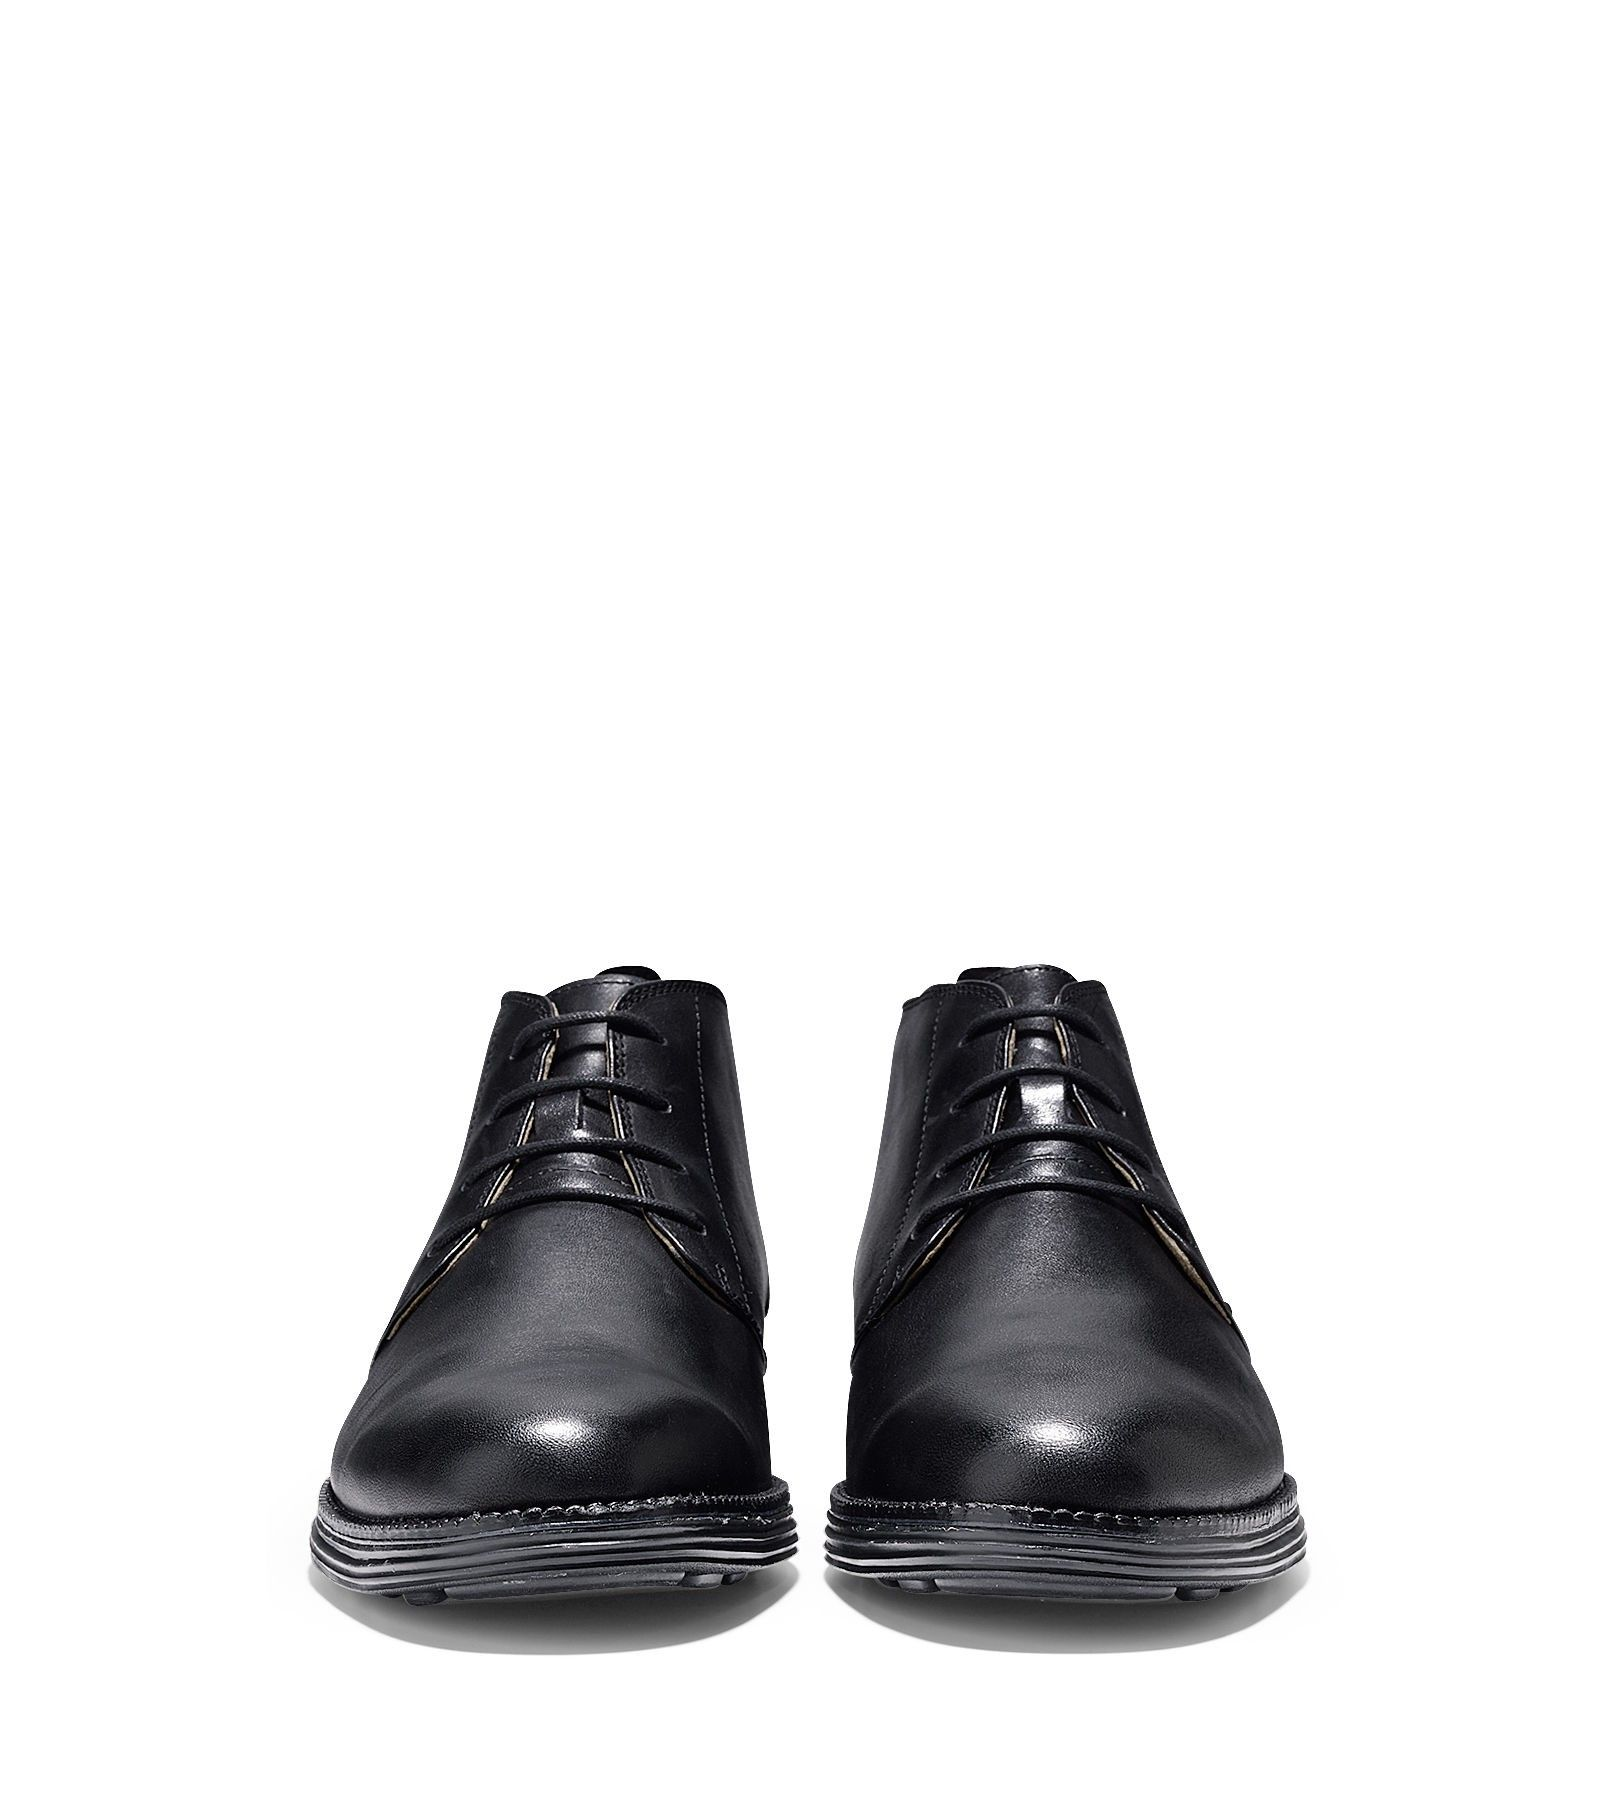 ØriginalGrand Chukka | Shoes mens, Oxford shoes, Dress